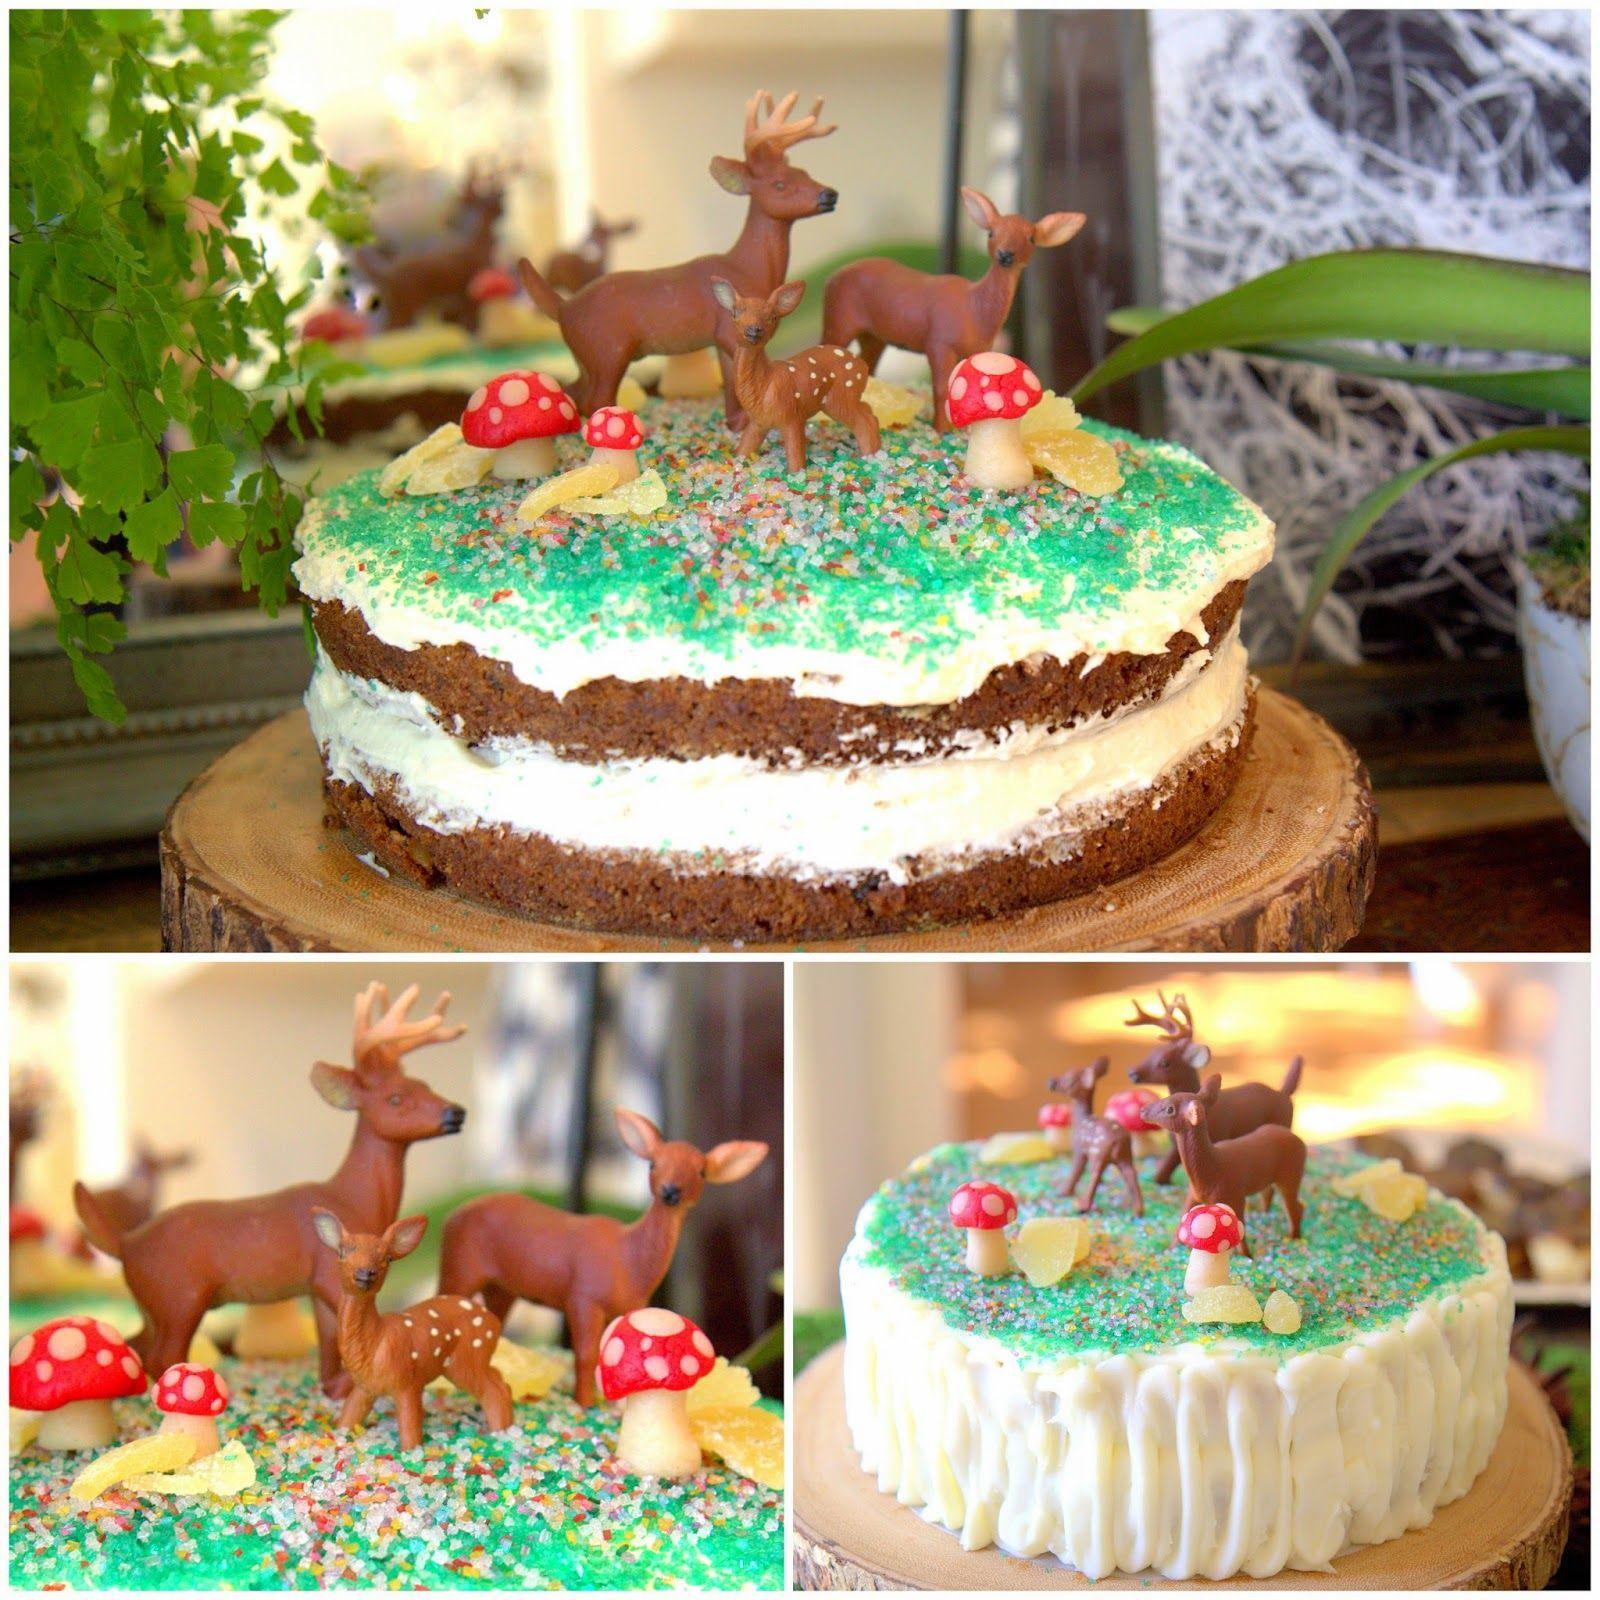 Woodland Party; Deer cakes, marzipan mushrooms, carrot